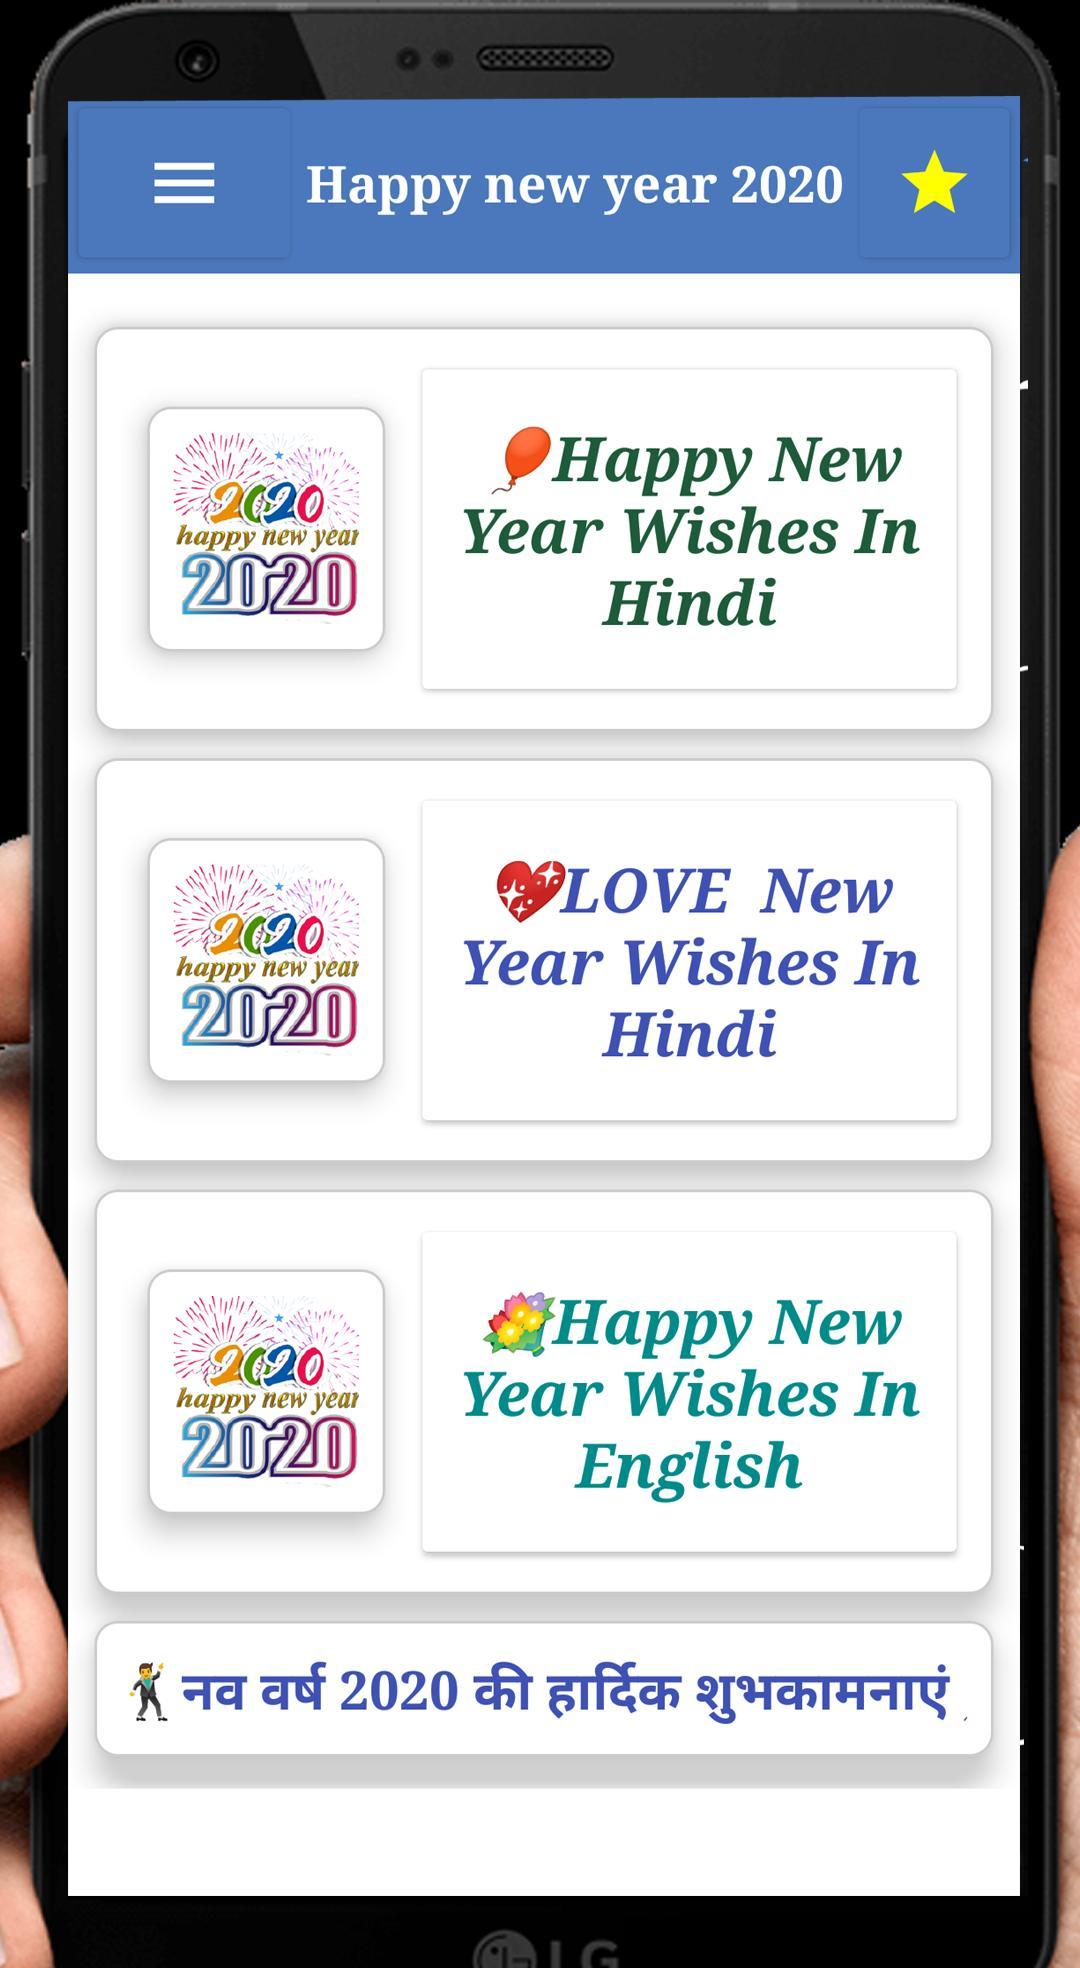 Happy New Year 2020 Shayari And Wishes для андроид скачать Apk